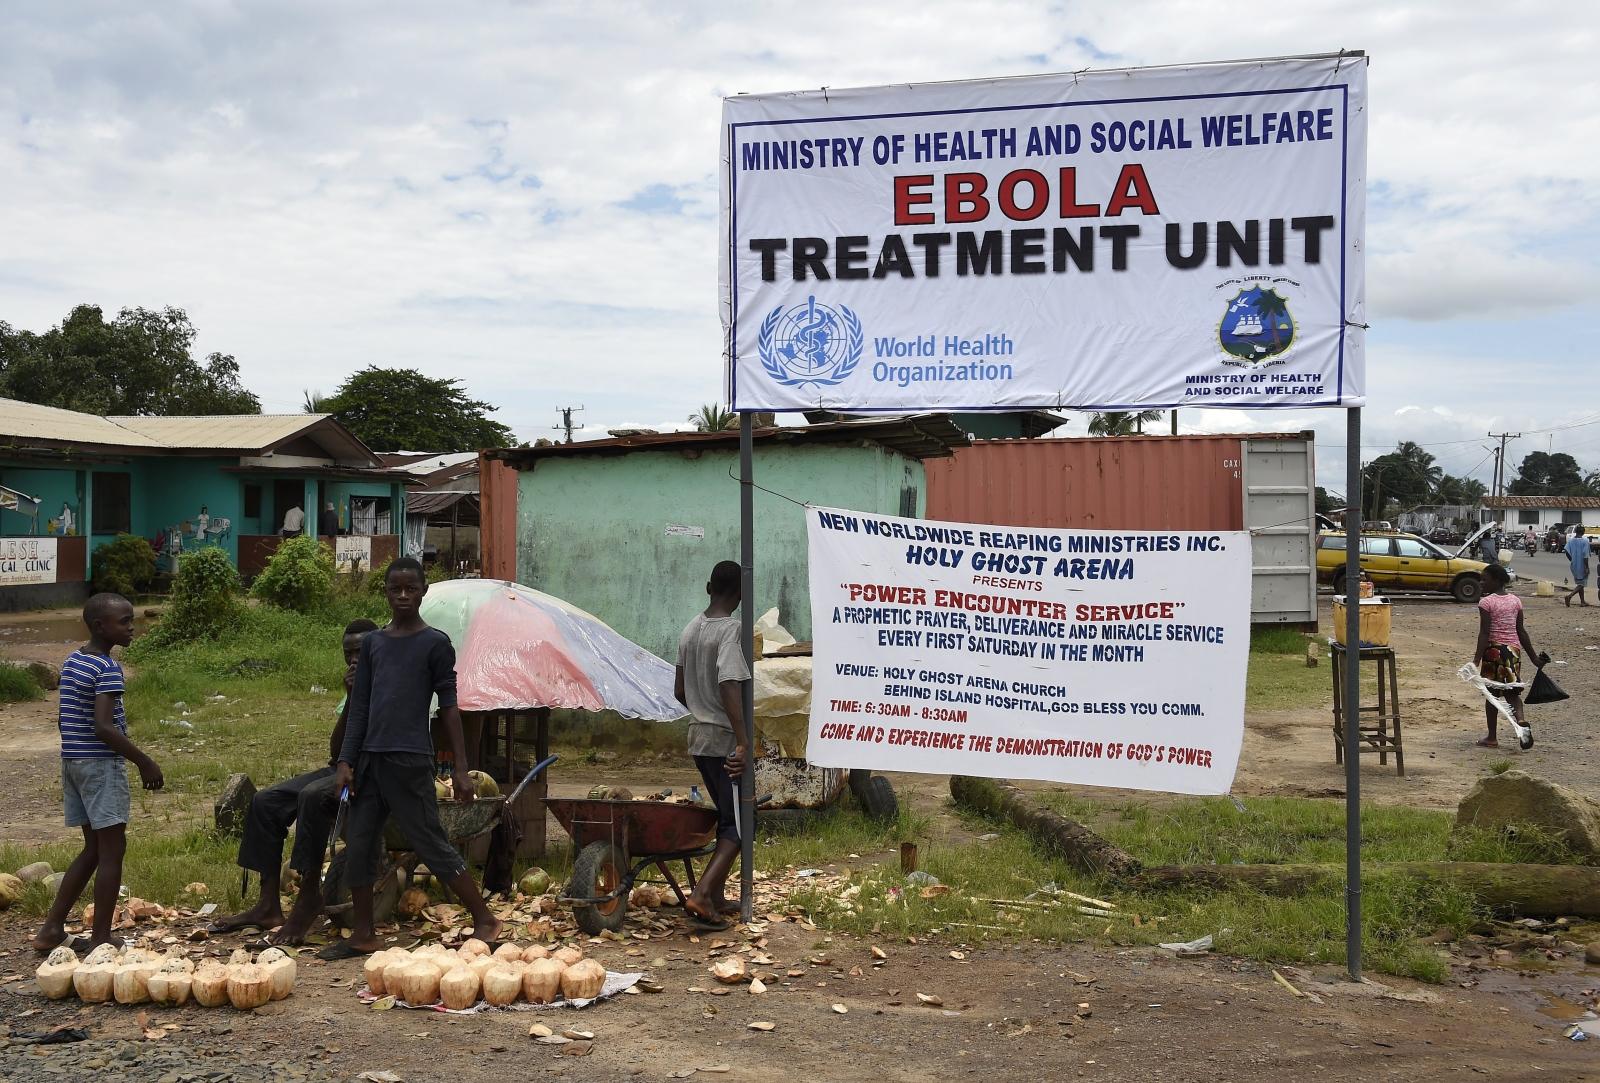 Ebola treatment clinic in Monrovia, Liberia